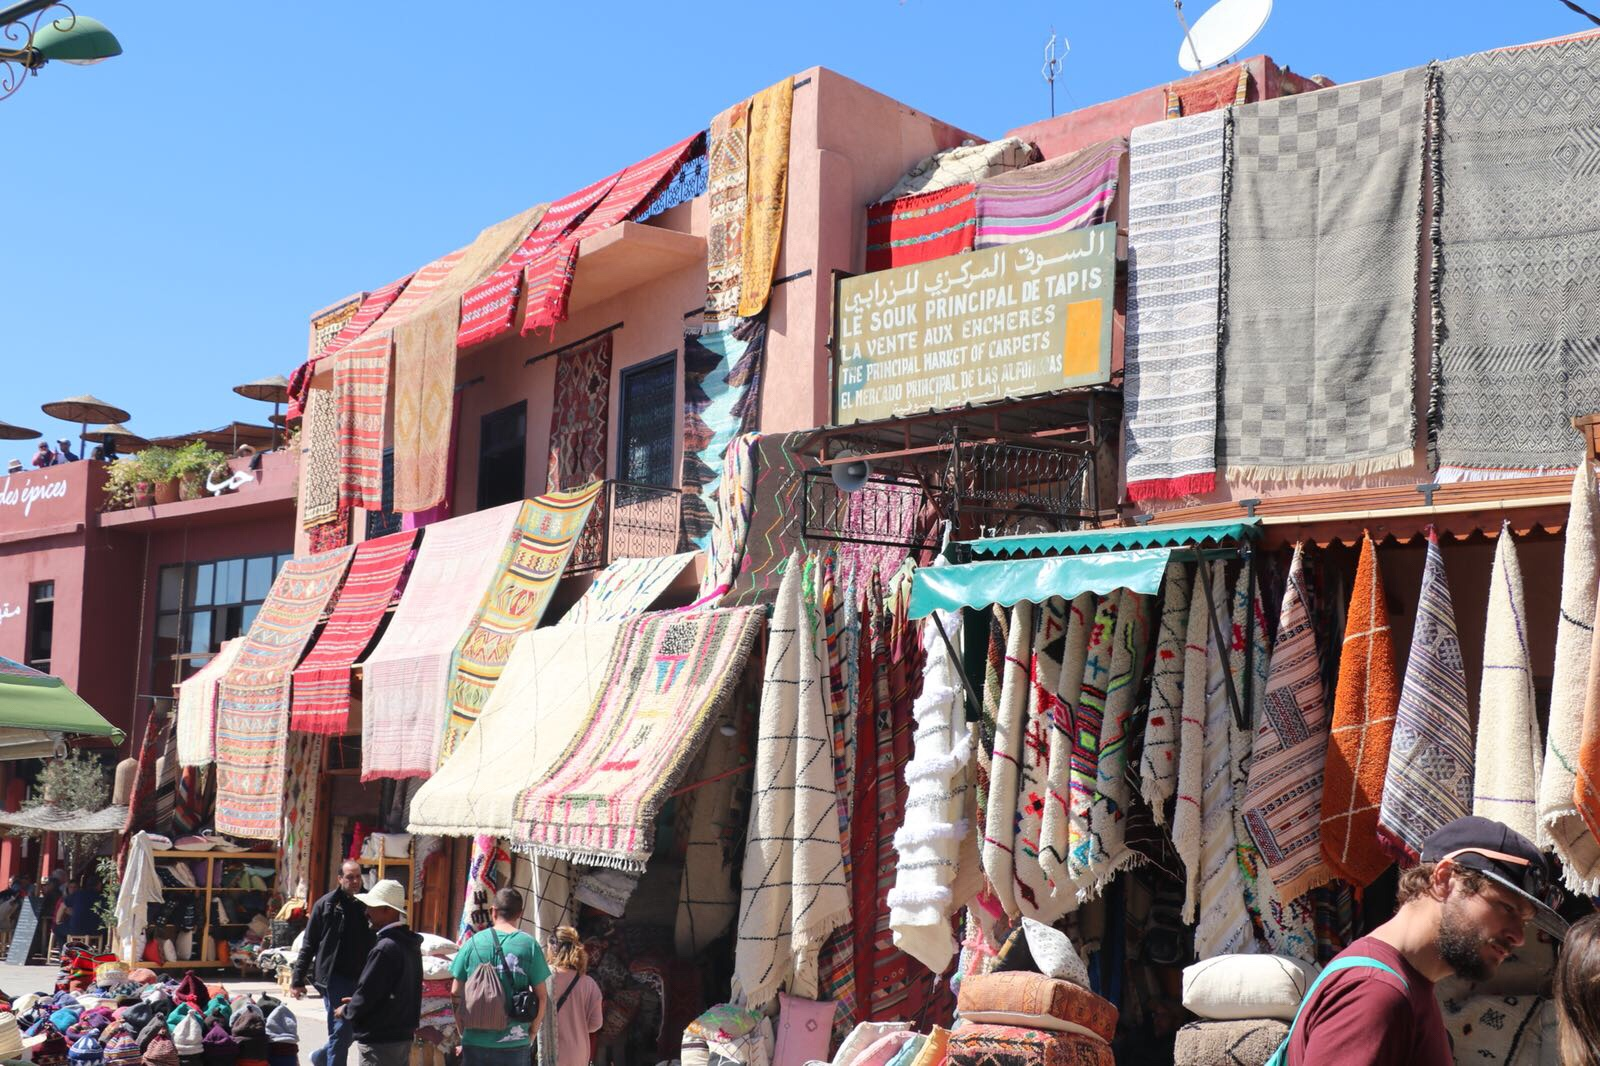 soukerna i marrakech